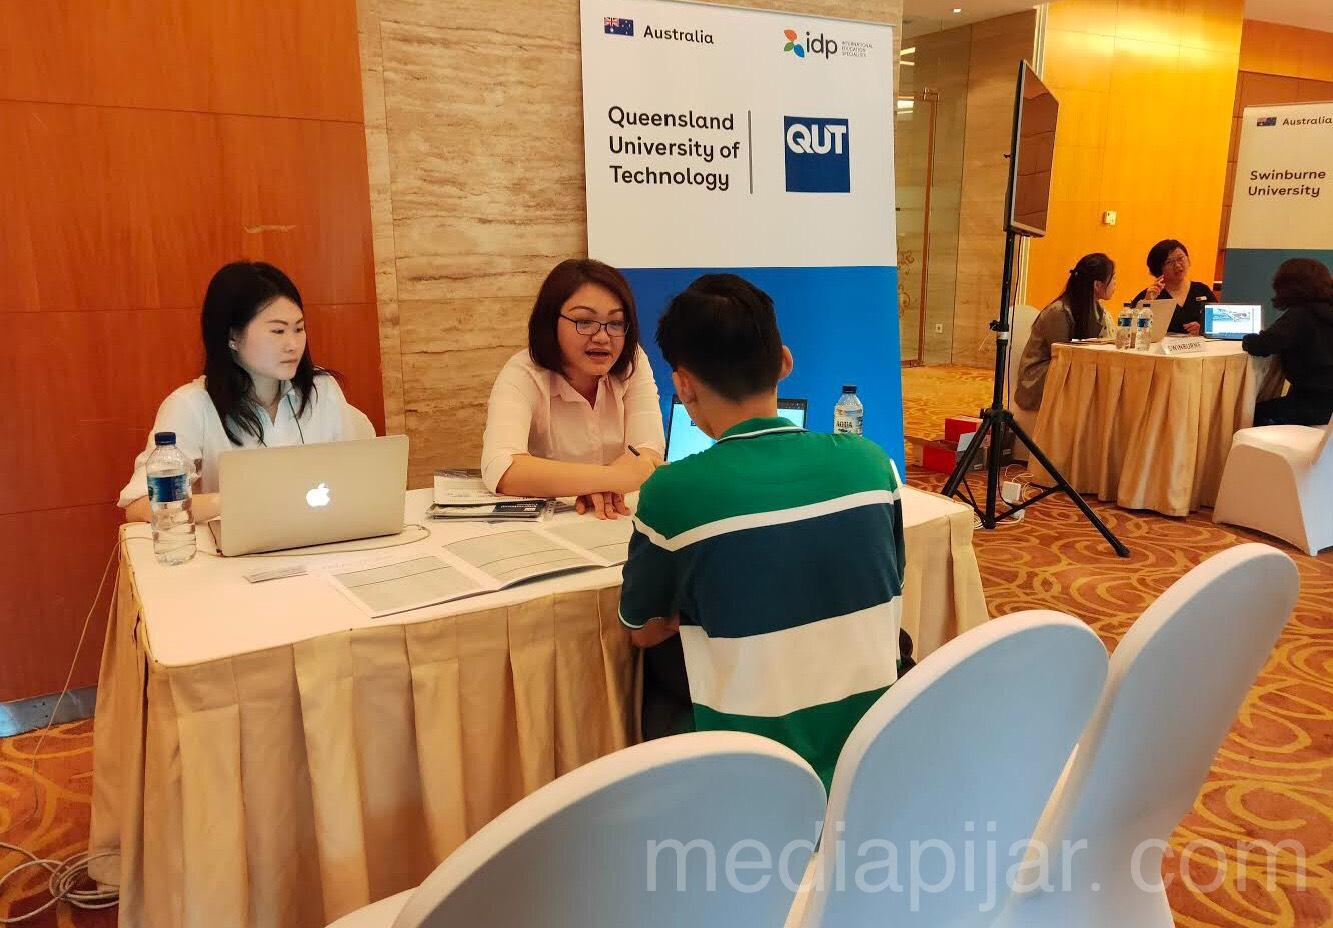 Pengunjung sedang konsultasi di Booth Queensland University of Technology pada Rabu (23/10) Fotografer: Rassya Priyandira